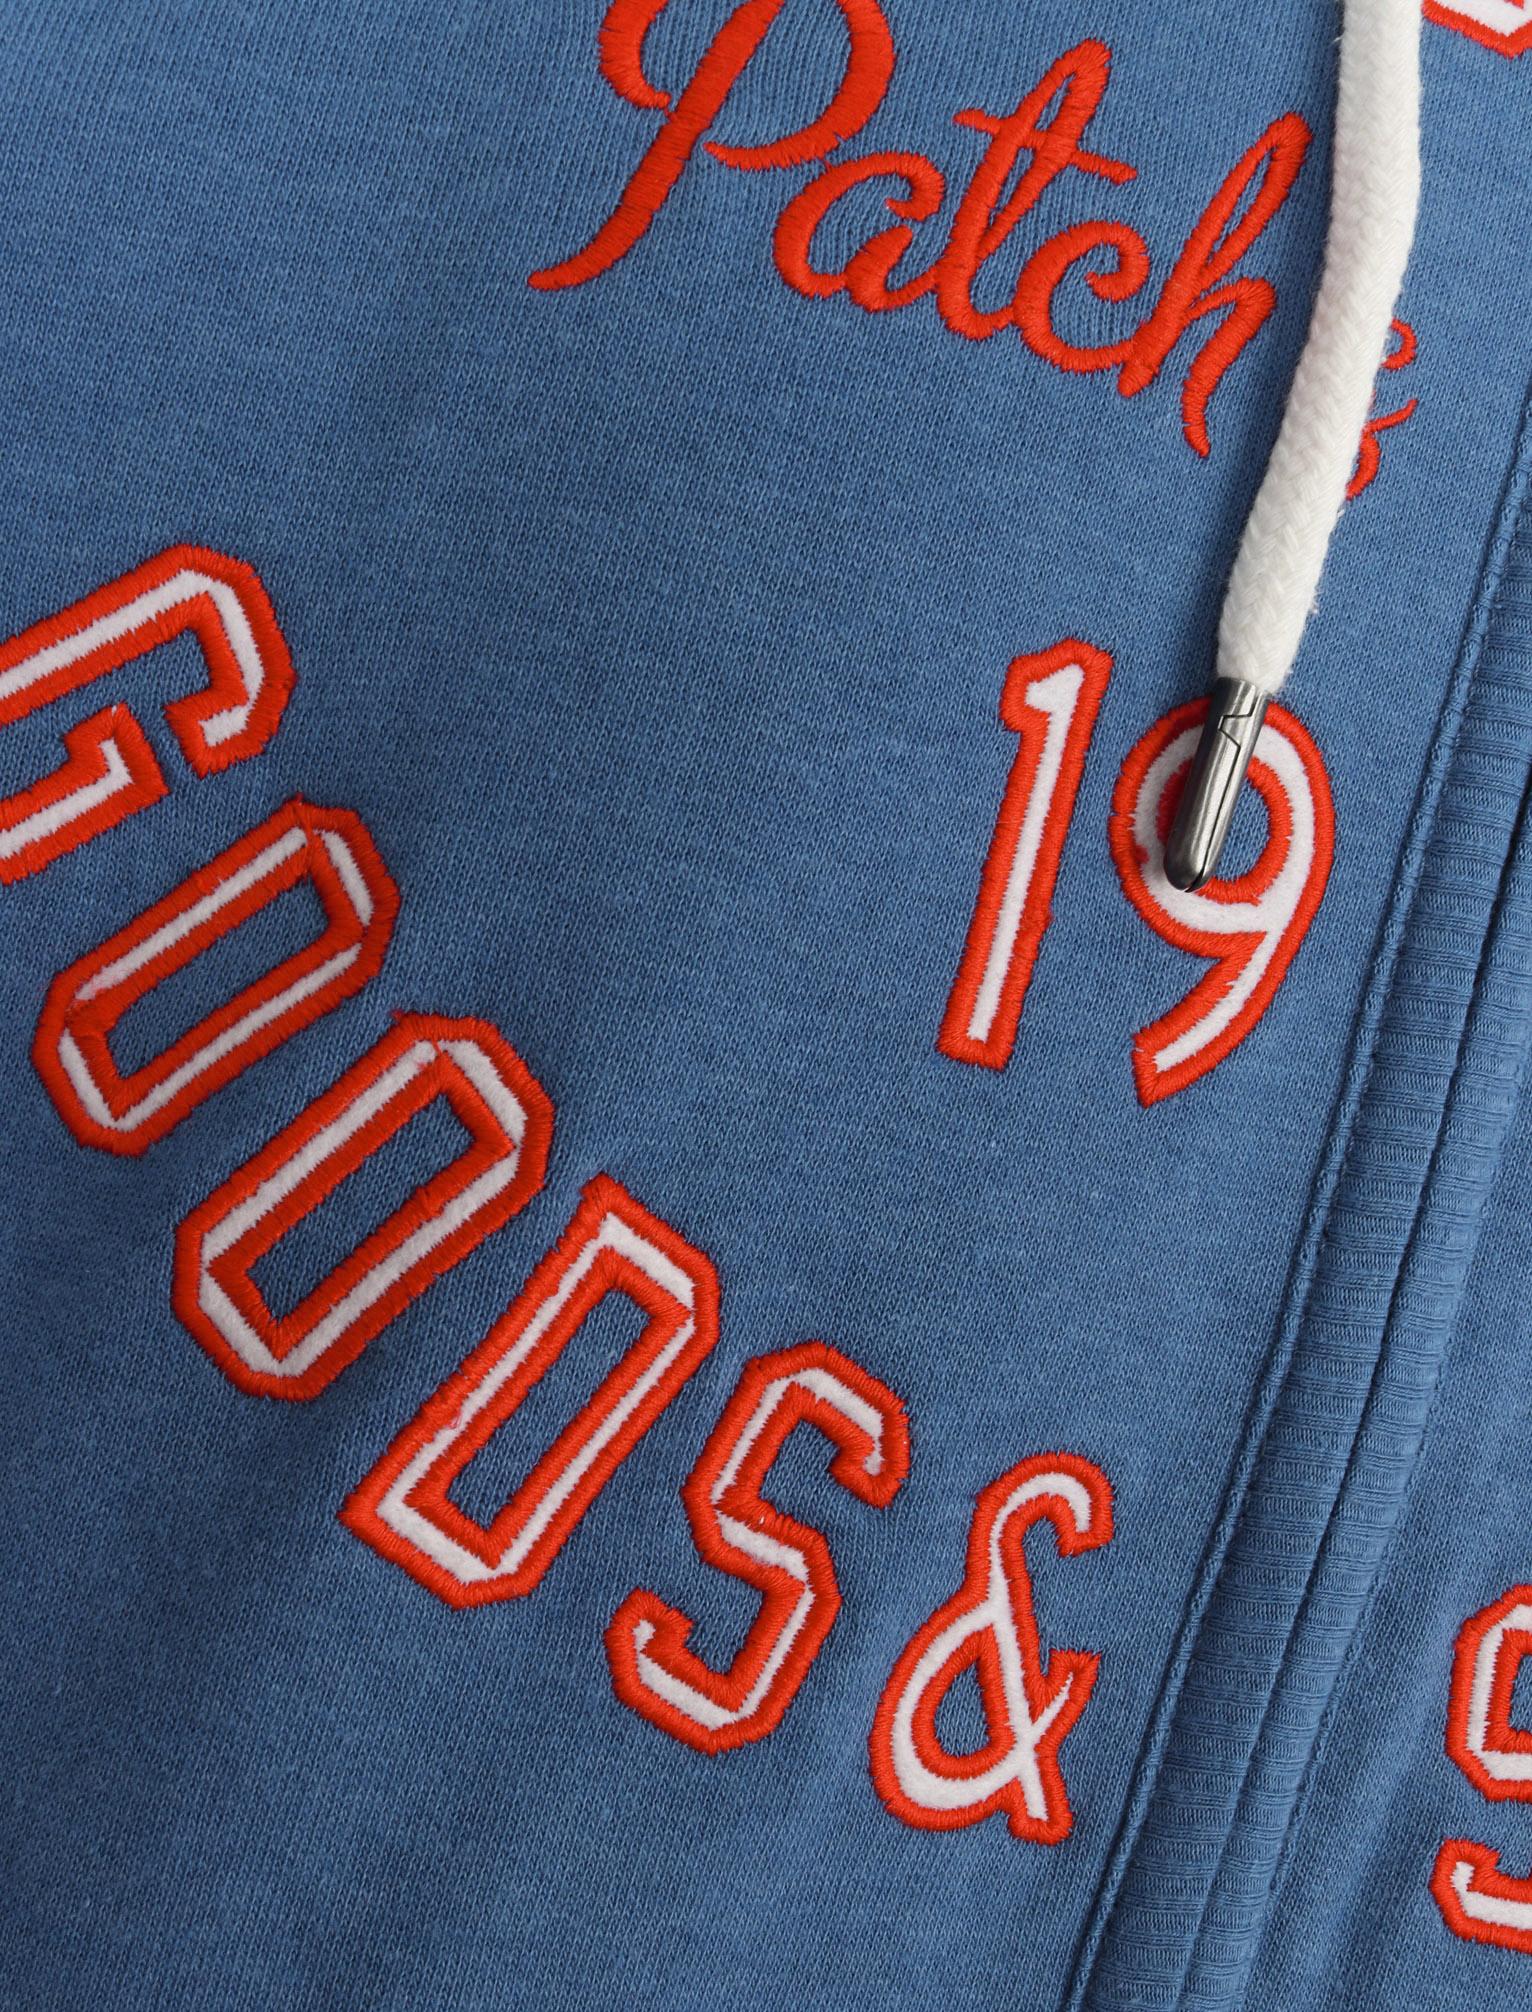 Tokyo-Laundry-Men-039-s-Harper-Zip-Up-Hoodie-Hooded-Top-Sweatshirt-Sweater-Jacket thumbnail 9